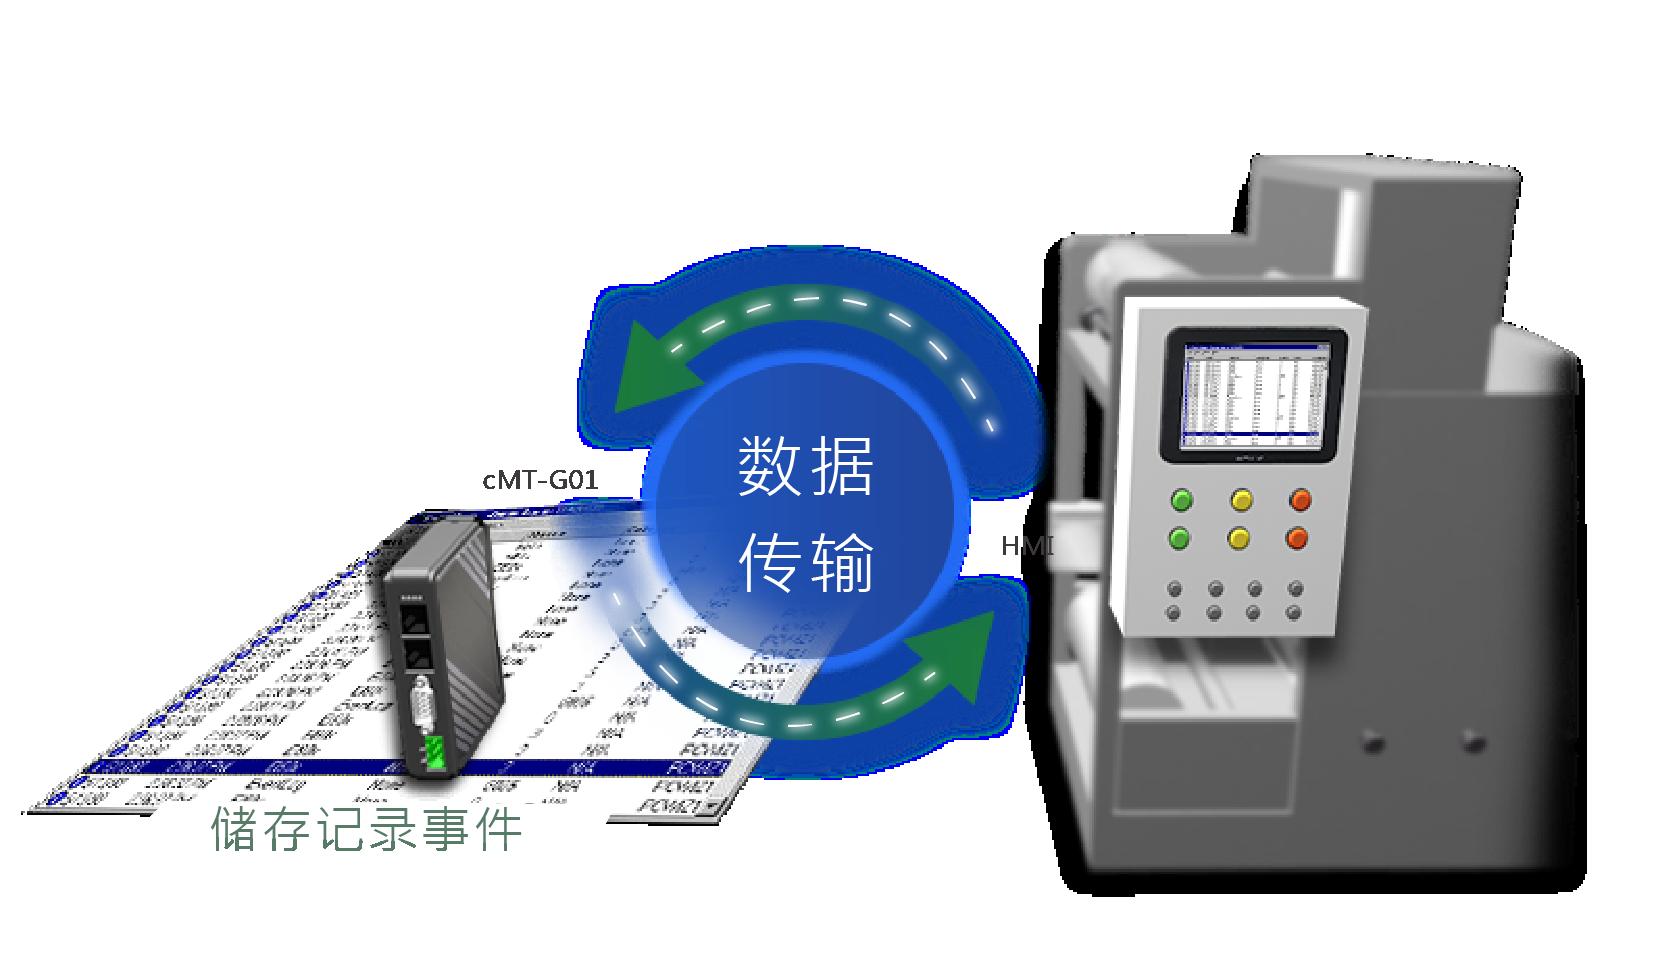 CMT-G01智慧通讯网关 深圳威纶通触摸屏 新品上市